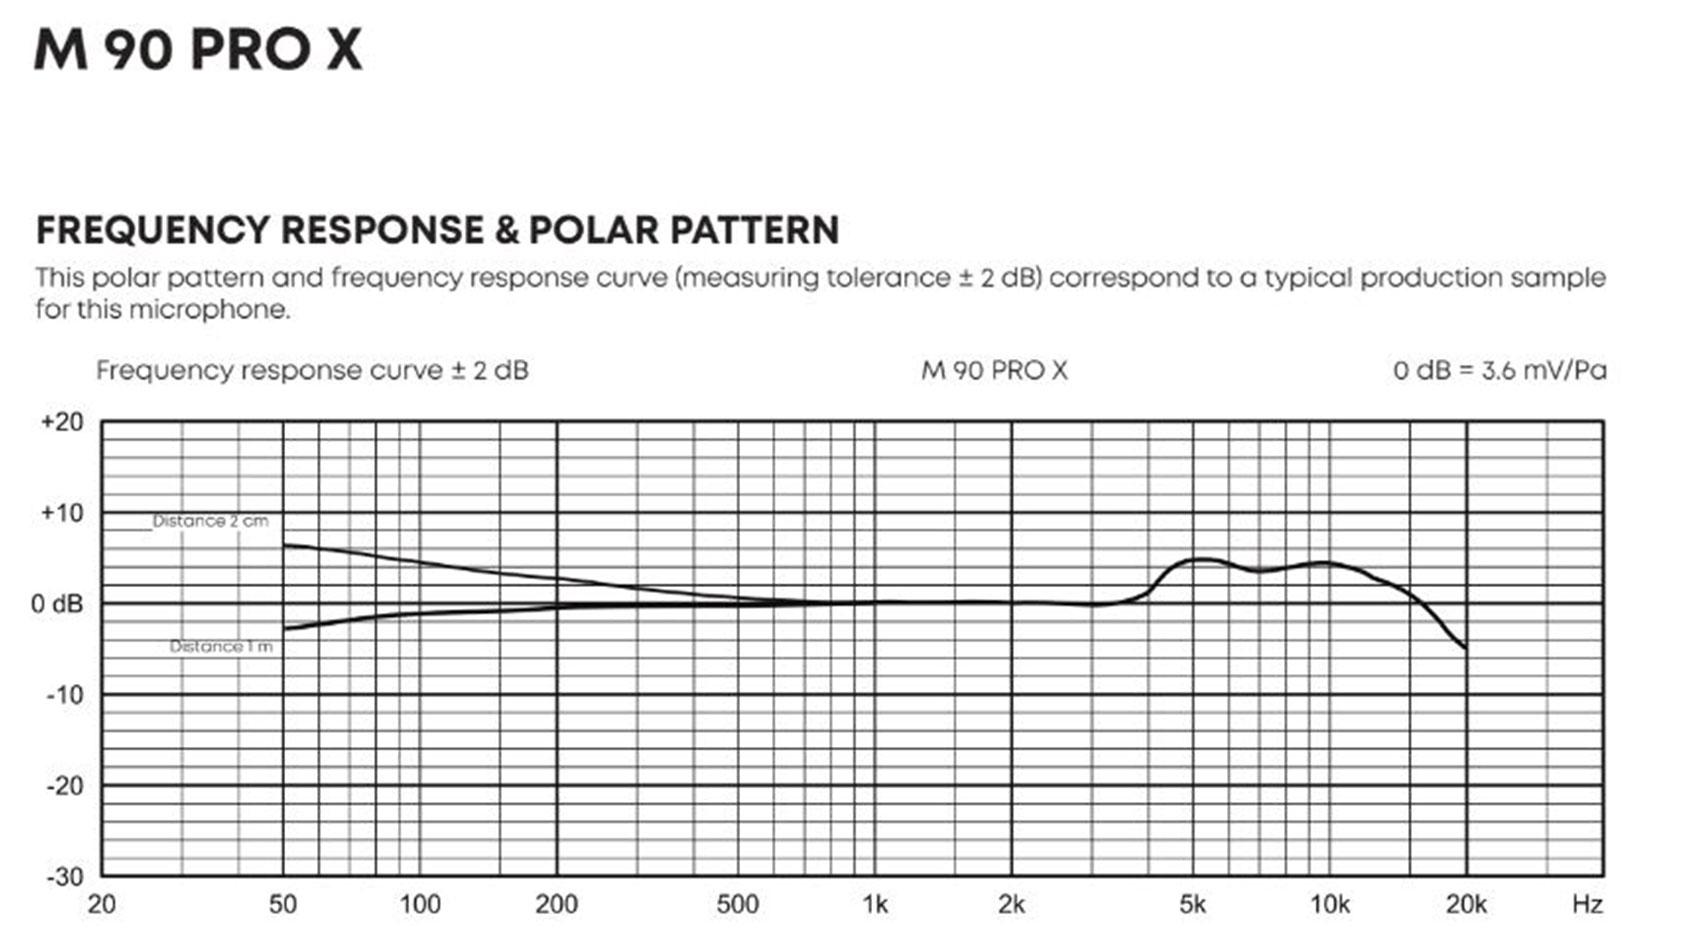 beyerdynamic m 90 pro x frequency response